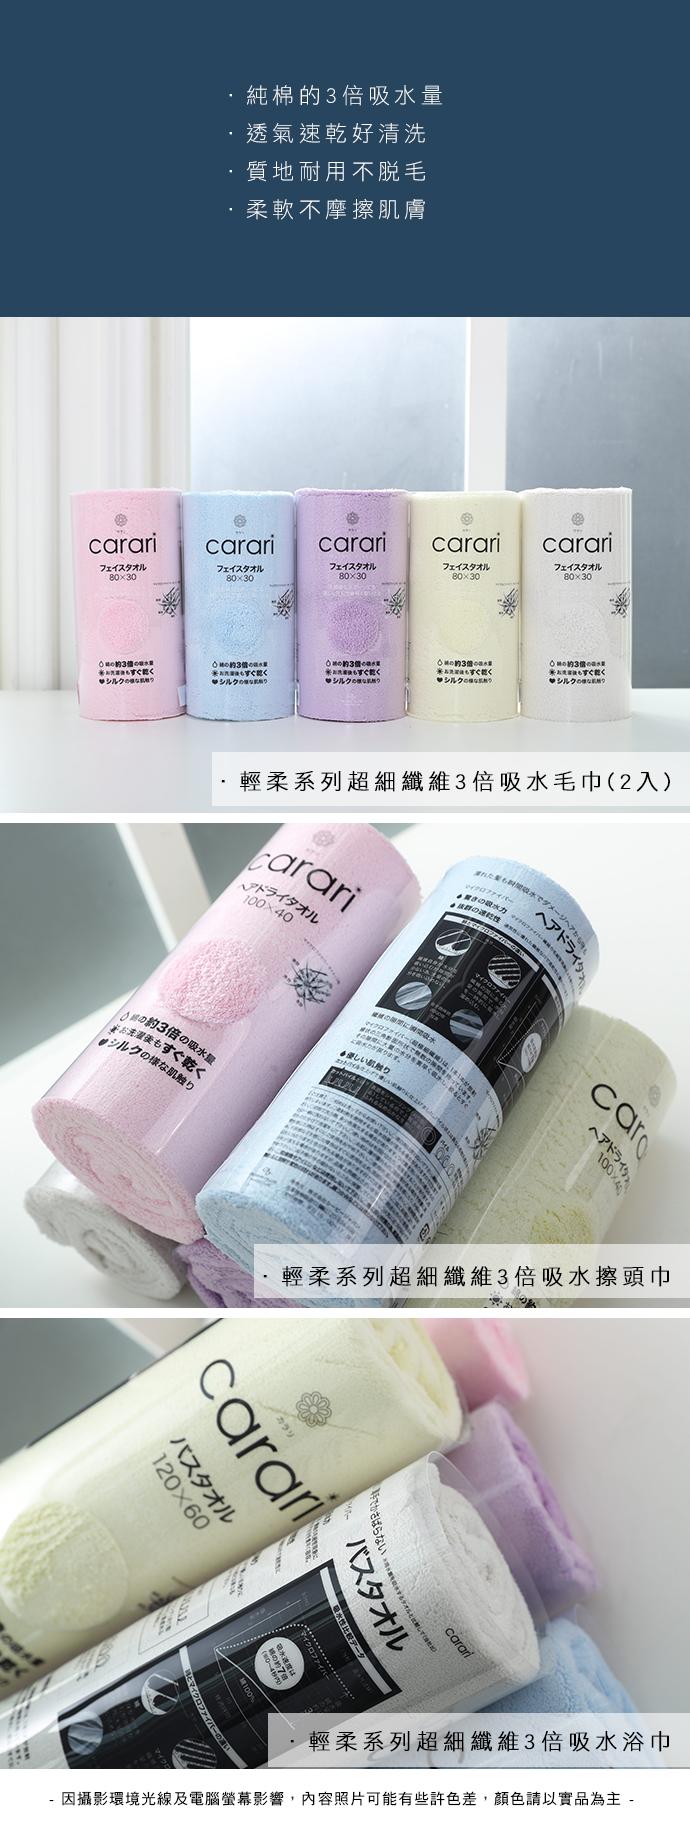 CB Japan|輕柔系列超細纖維3倍吸水擦頭巾 - 甜心粉